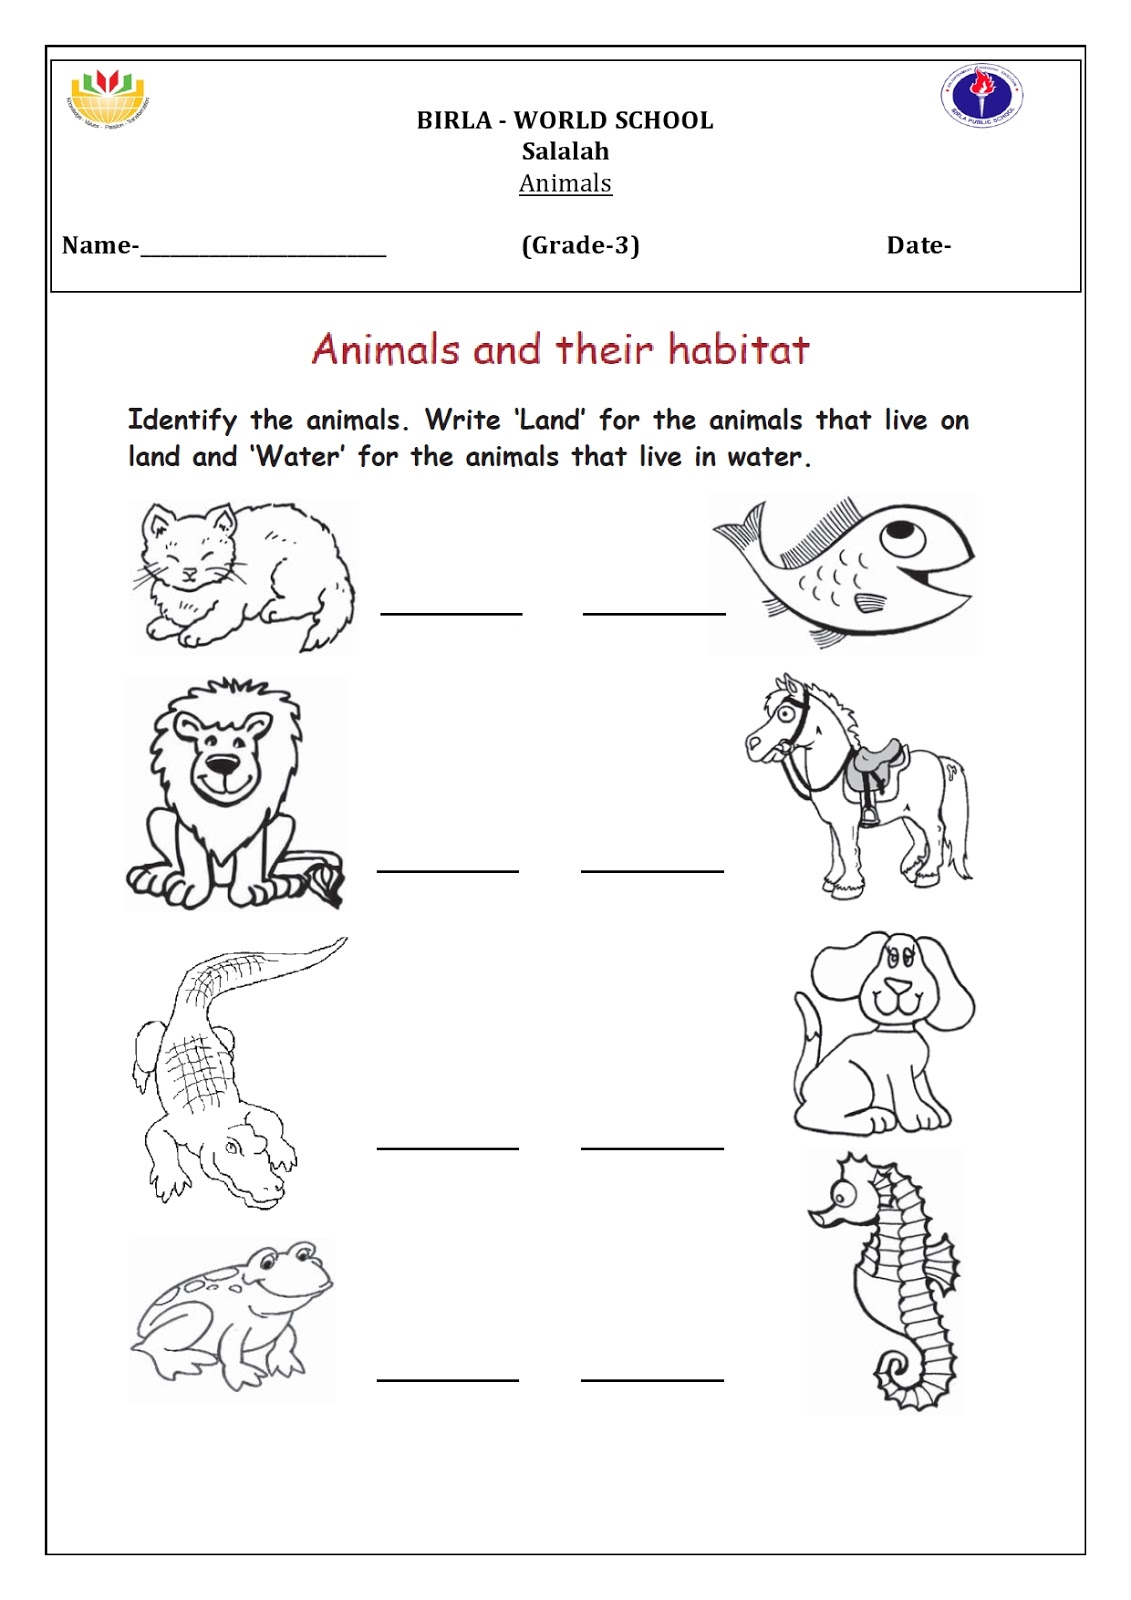 Birla World School Oman Homework For Grade 3 B On 18 08 16